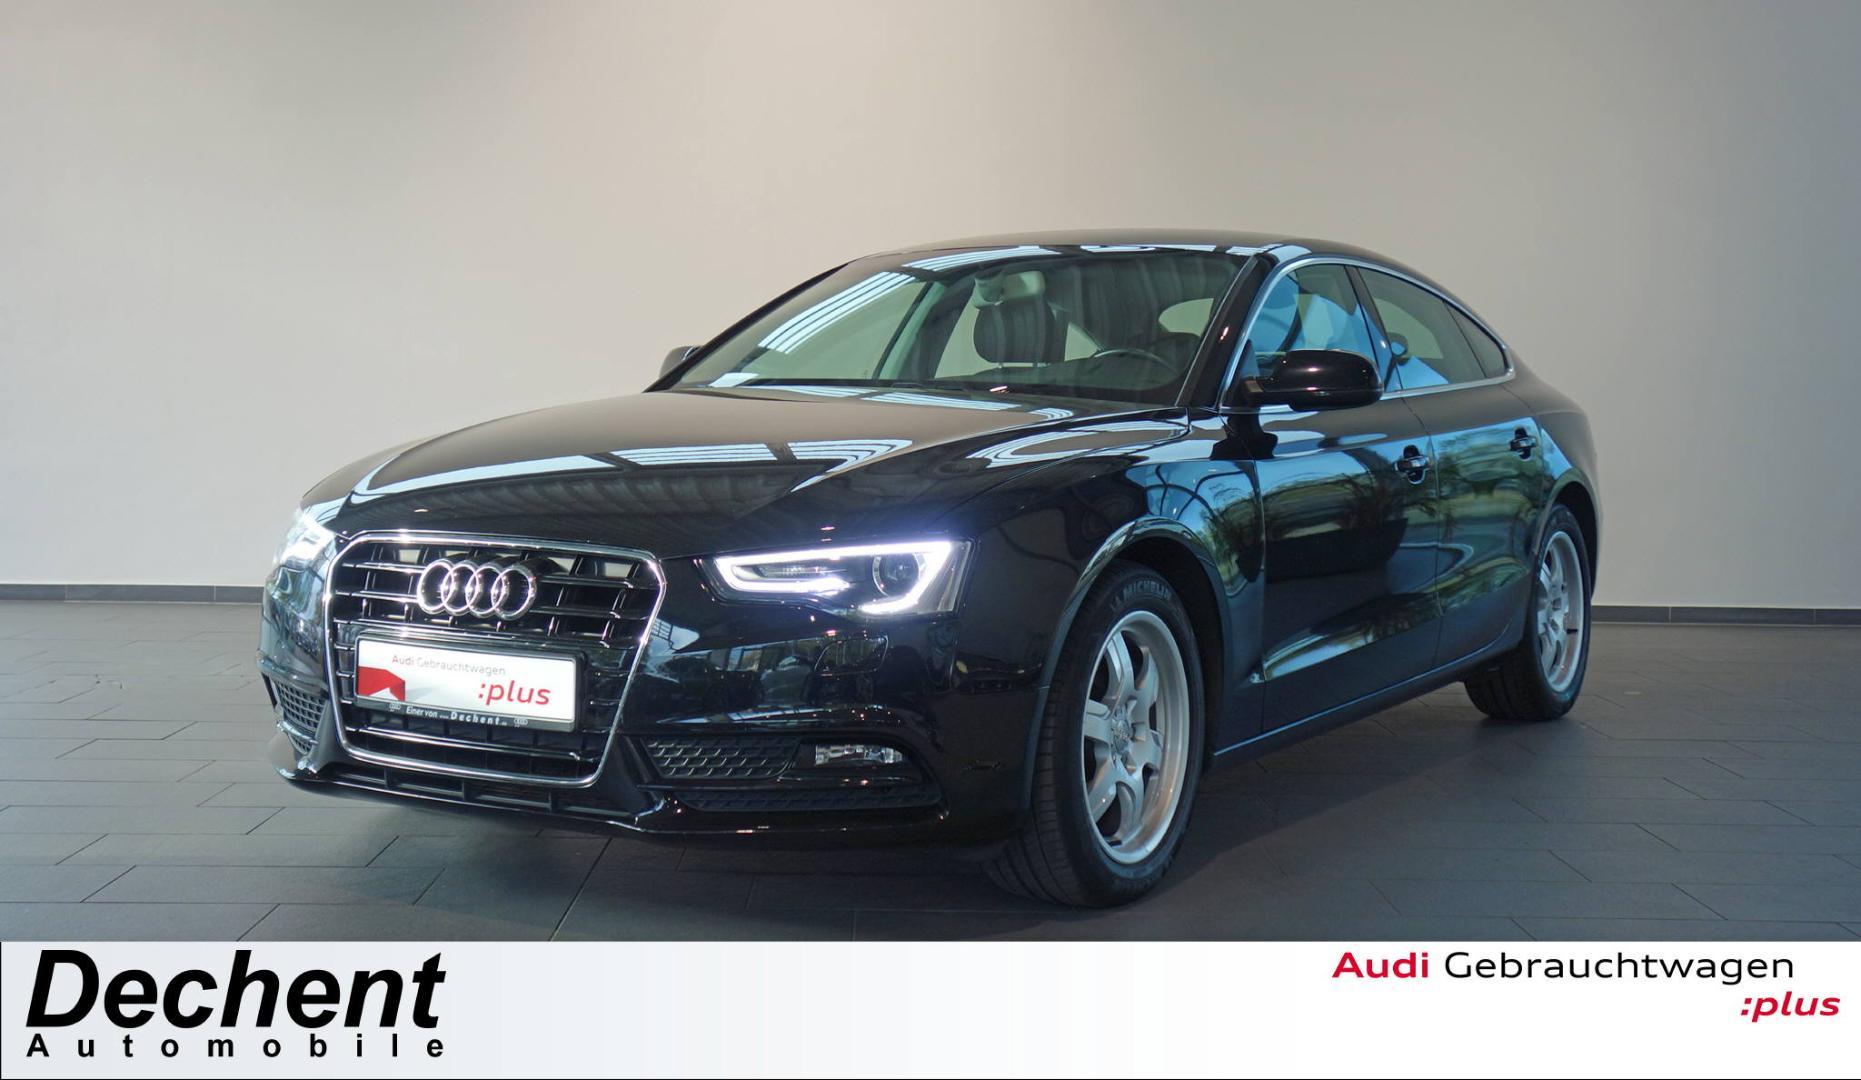 Audi A5 Sportback 2.0 TDI ultra Standhzg Xenon Navi P, Jahr 2016, Diesel